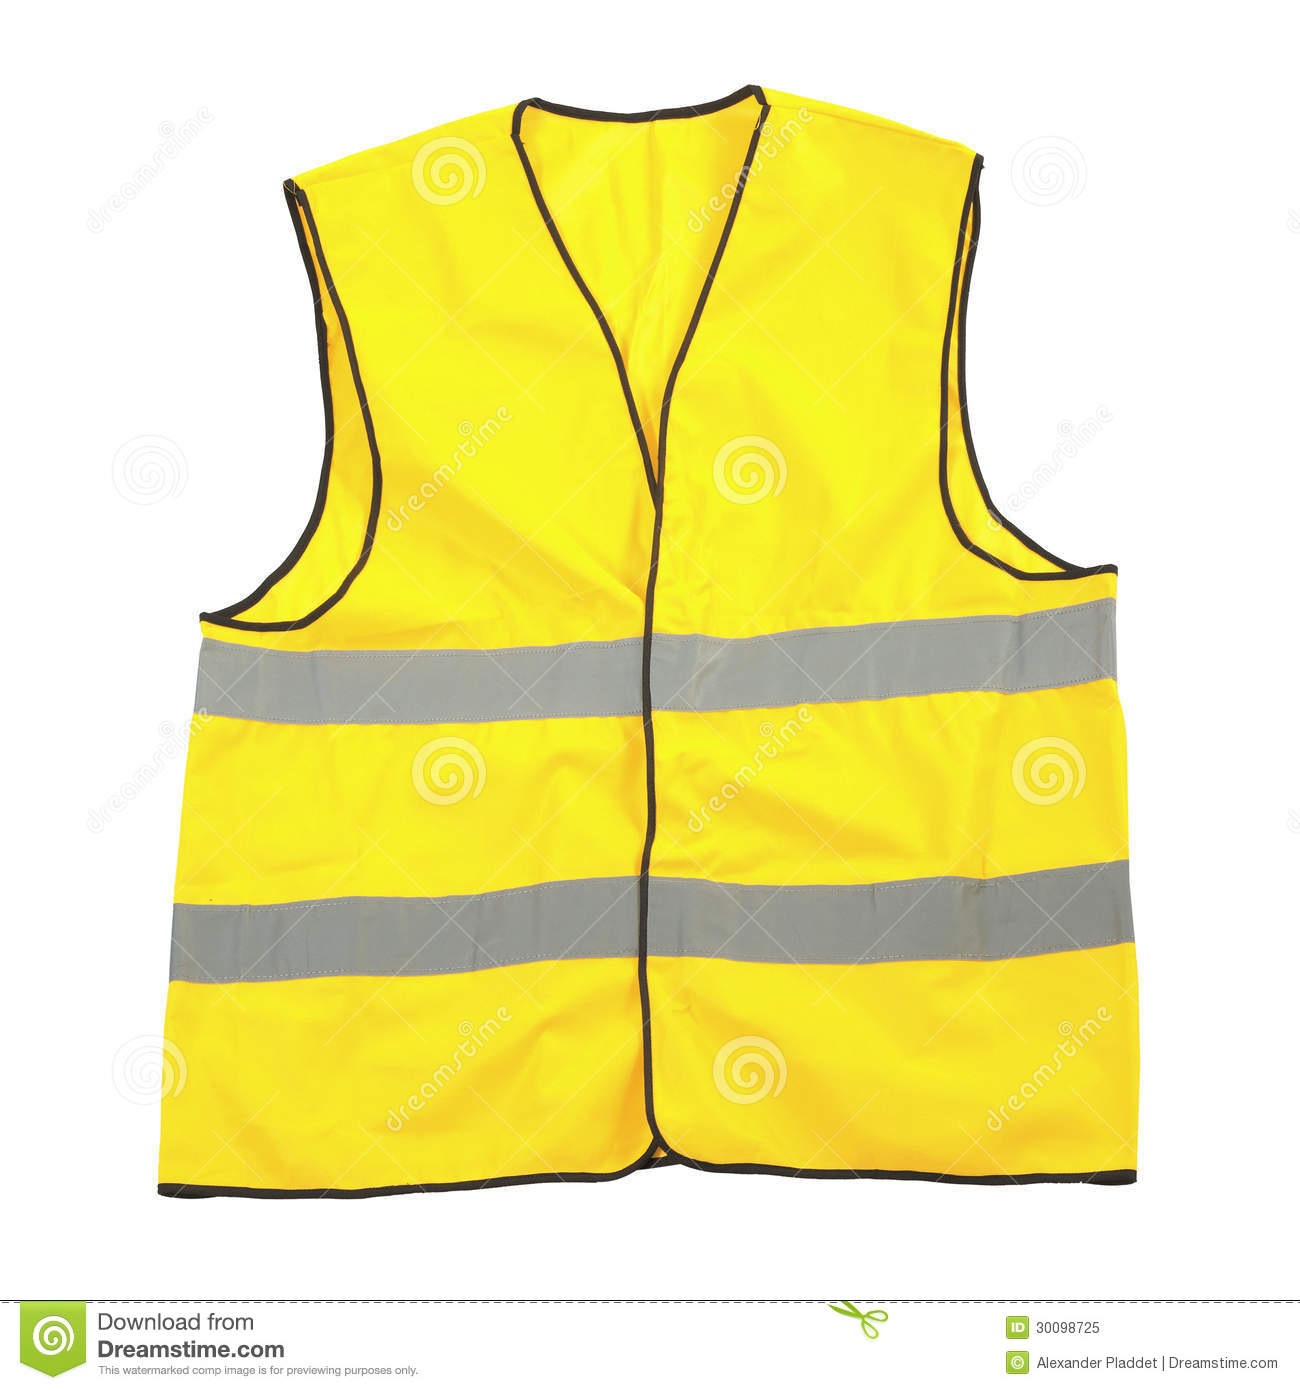 Safety vest clip art free.